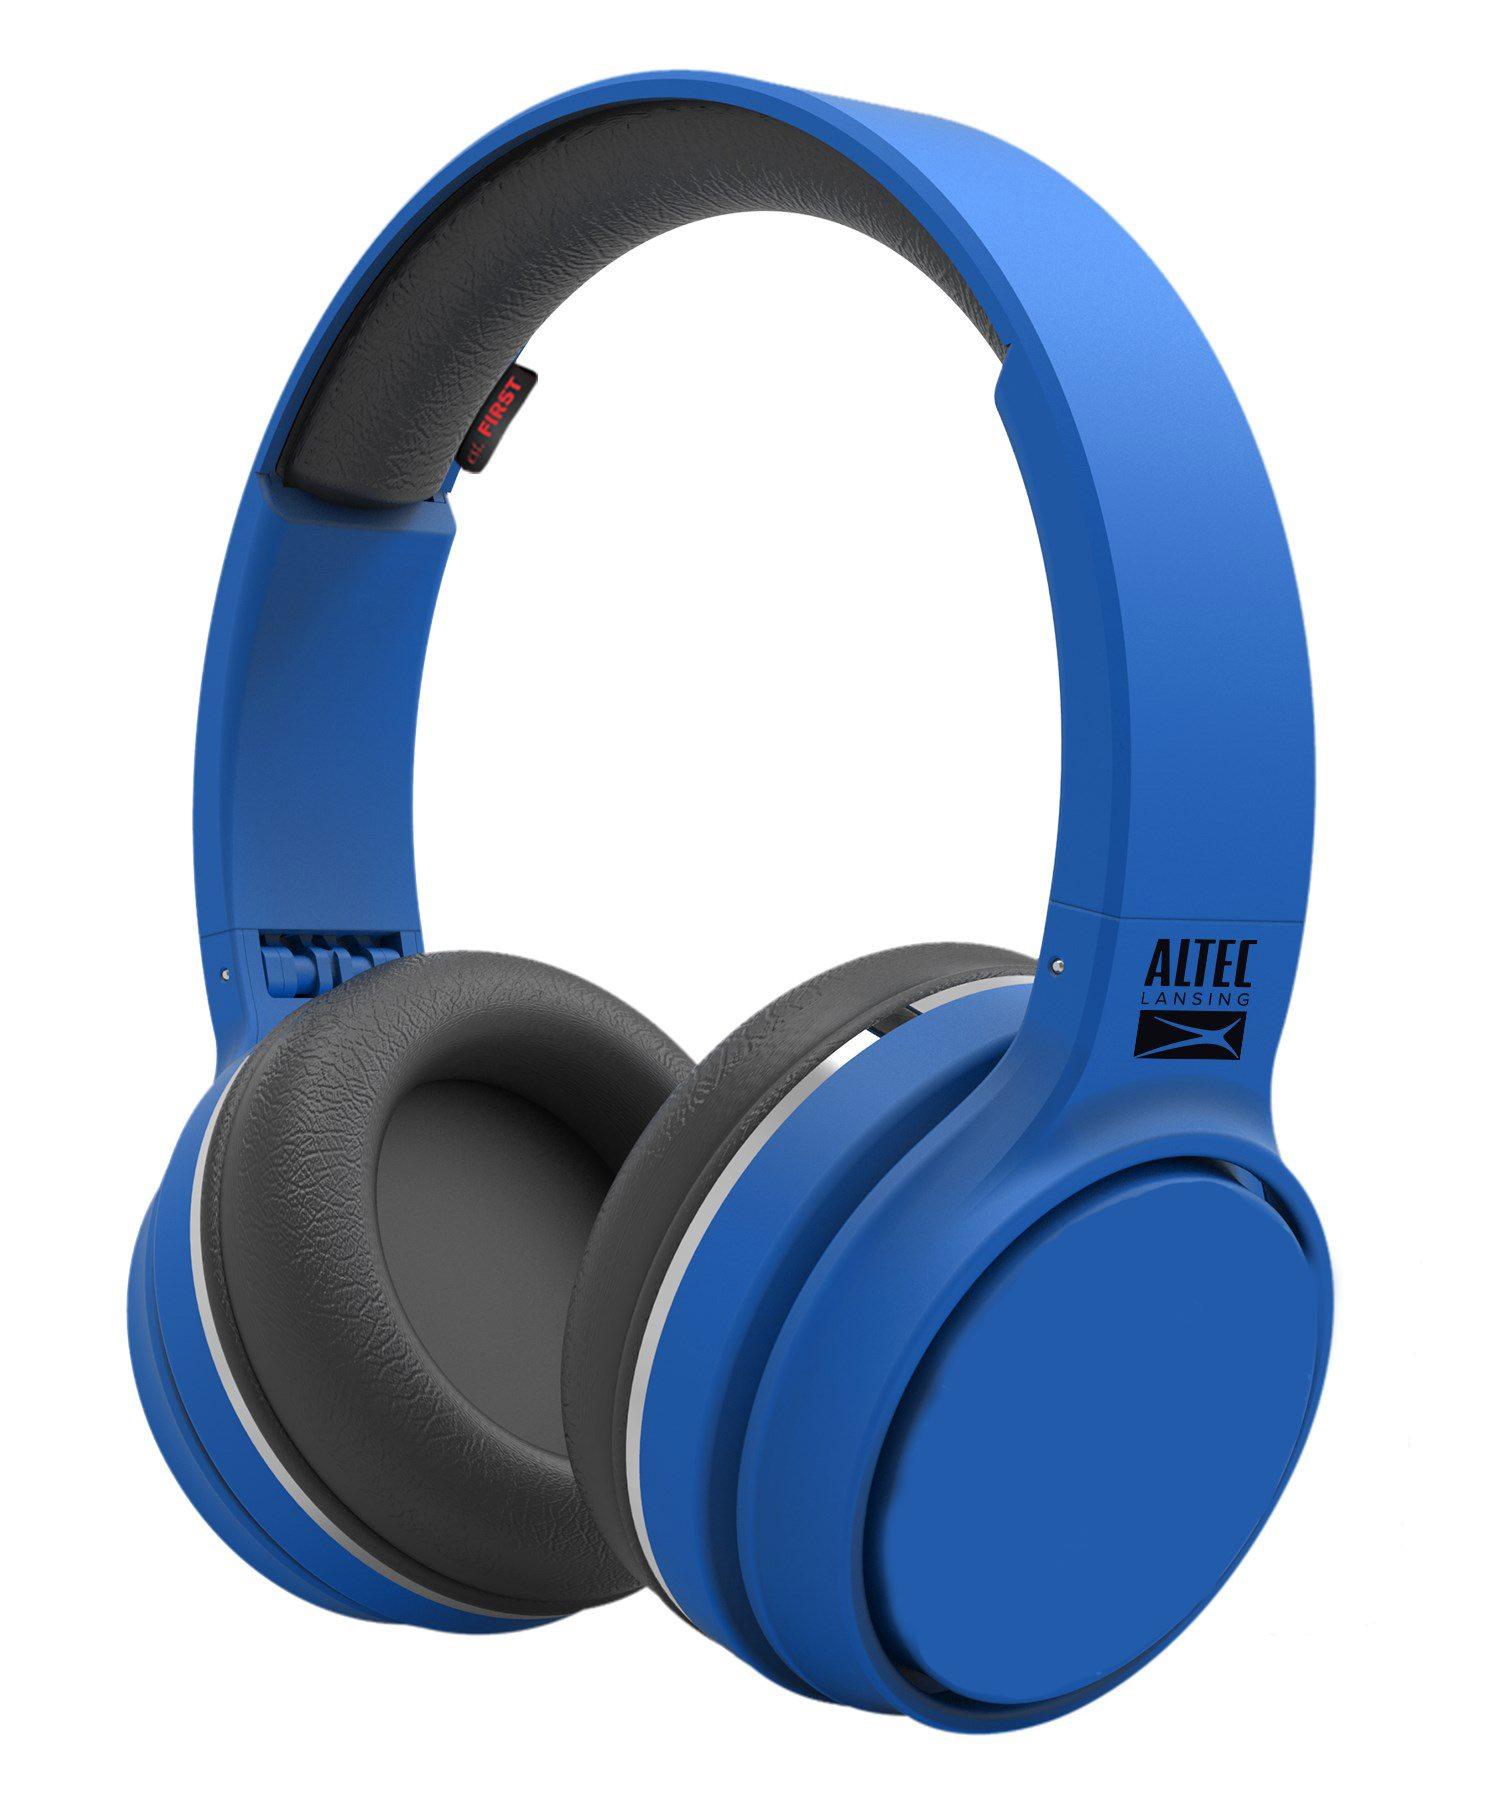 ALTEC LANSING bluetooth headphones Ring 'n' Go, 110dB, 40mm, μπλε - ALTEC 21743